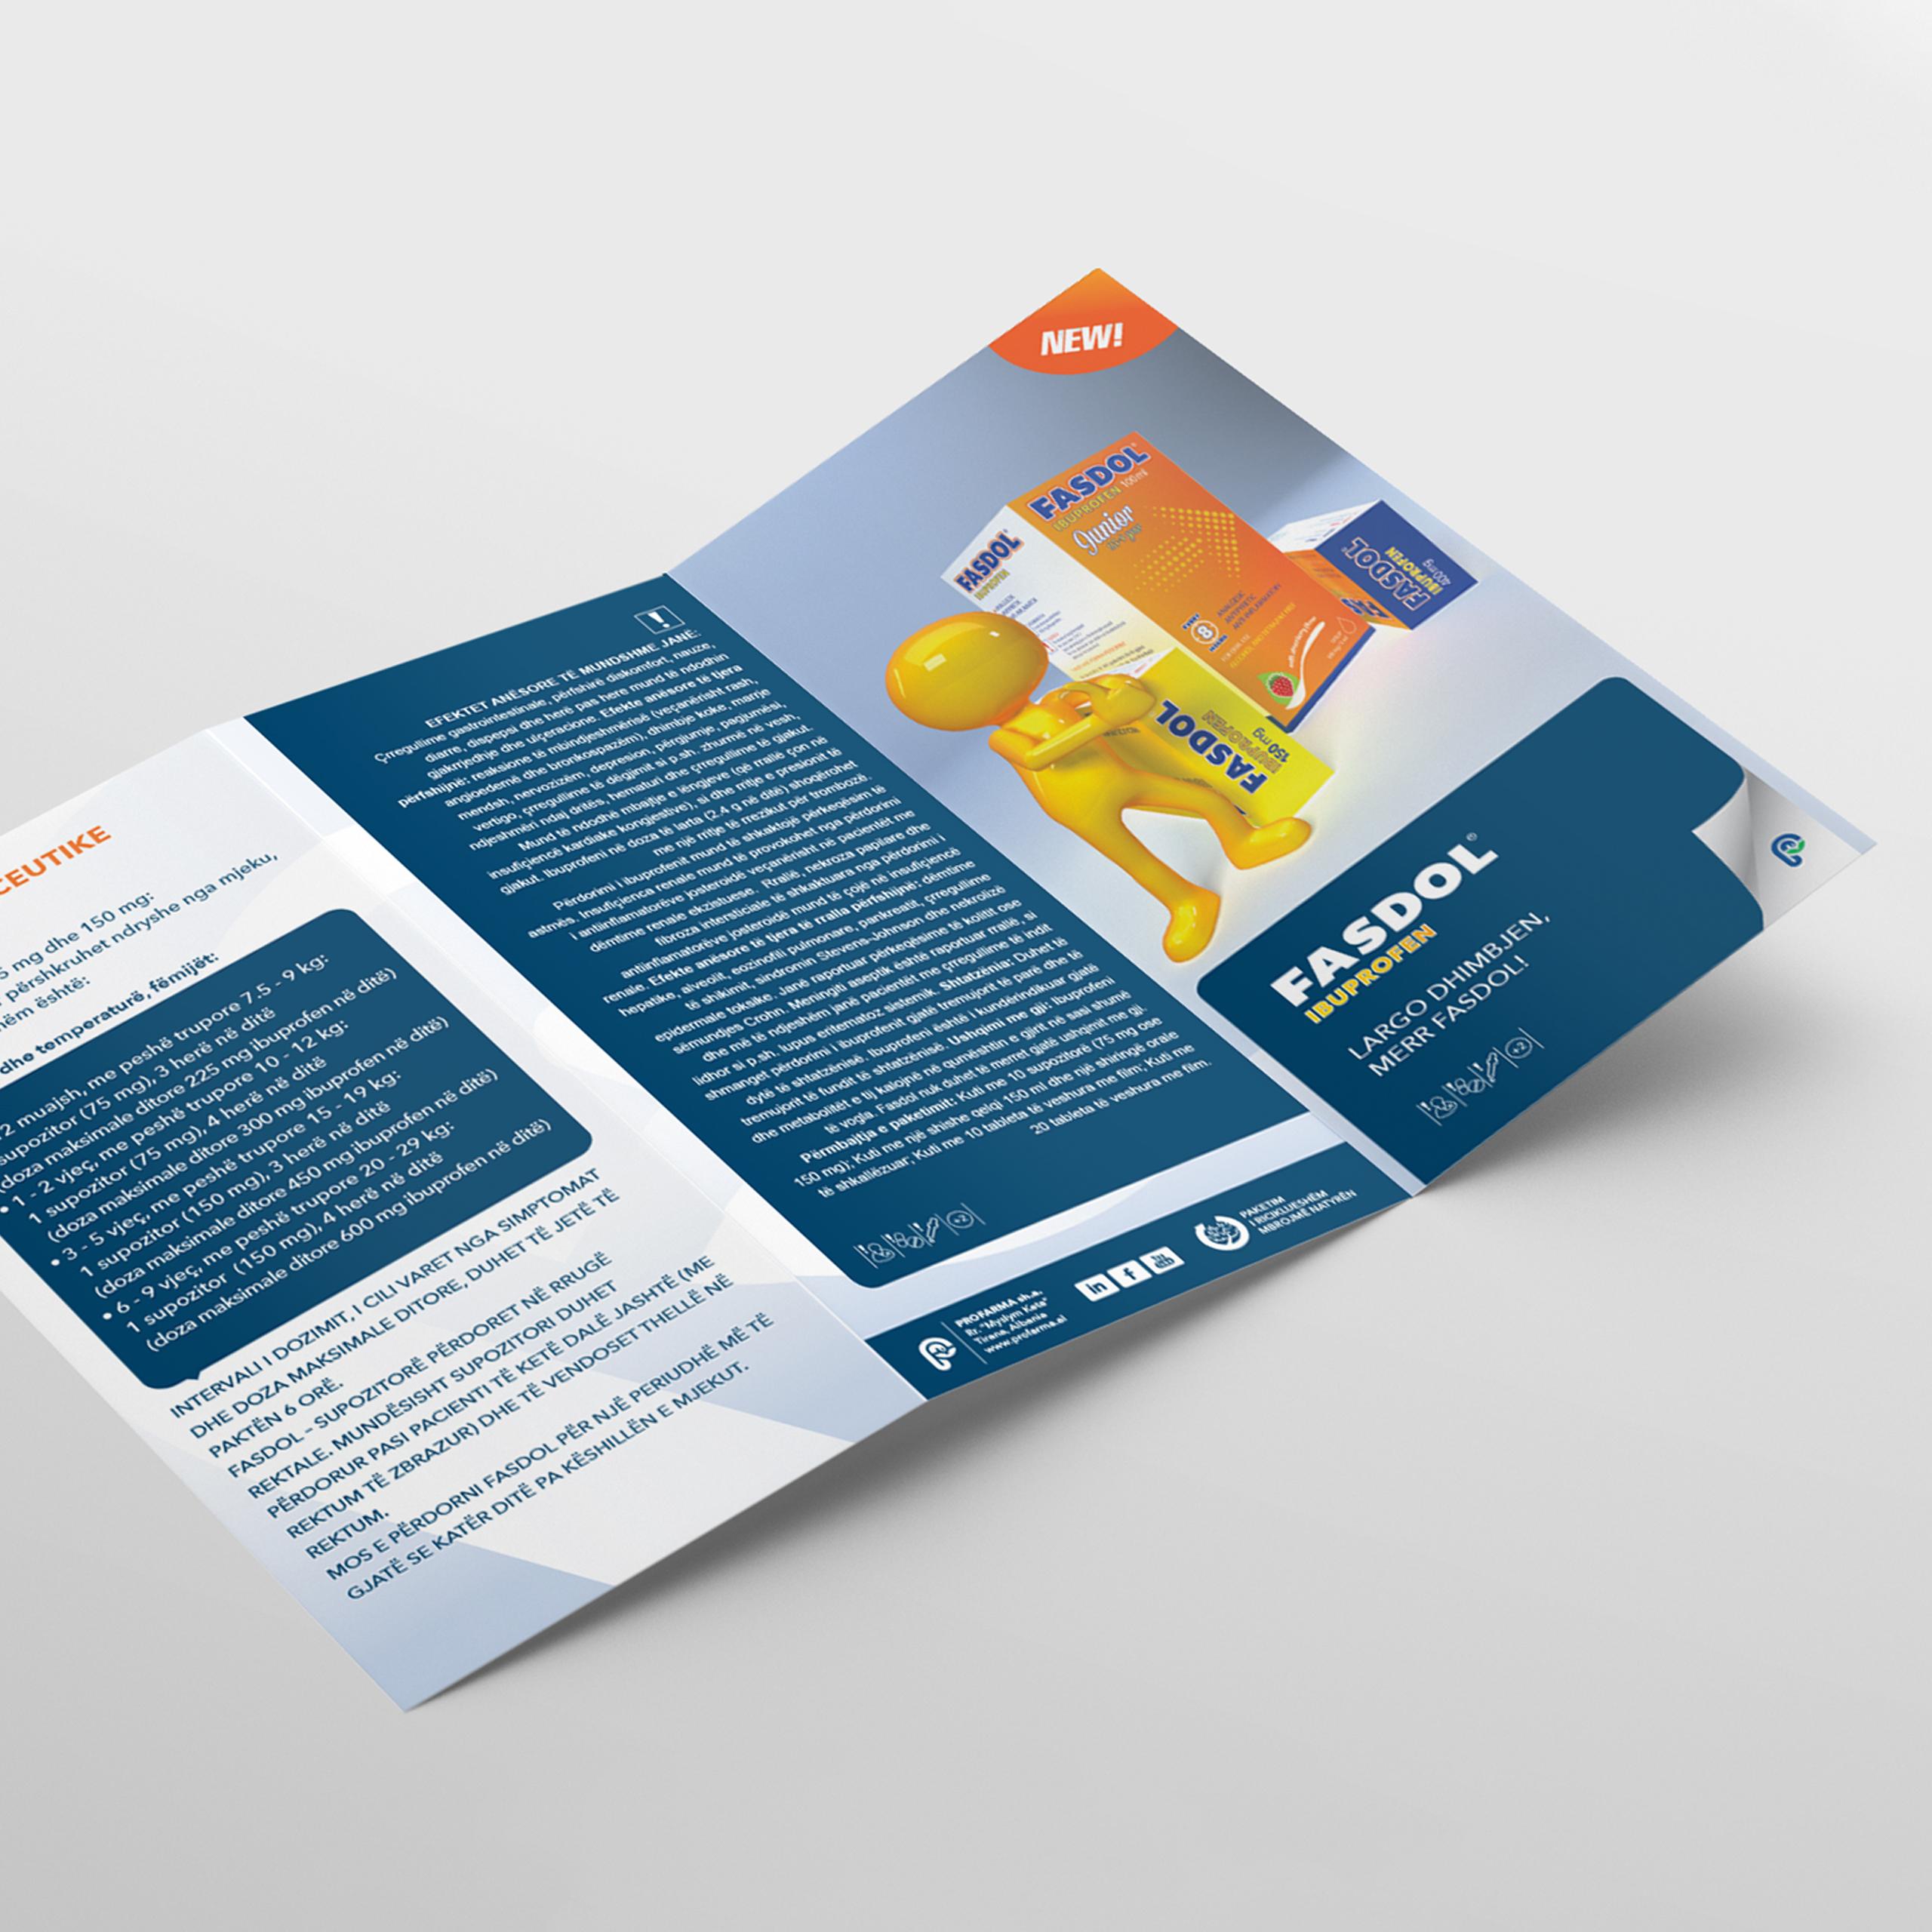 Profarma, Project Img 27 - Vatra Agency / Founder & CEO Gerton Bejo